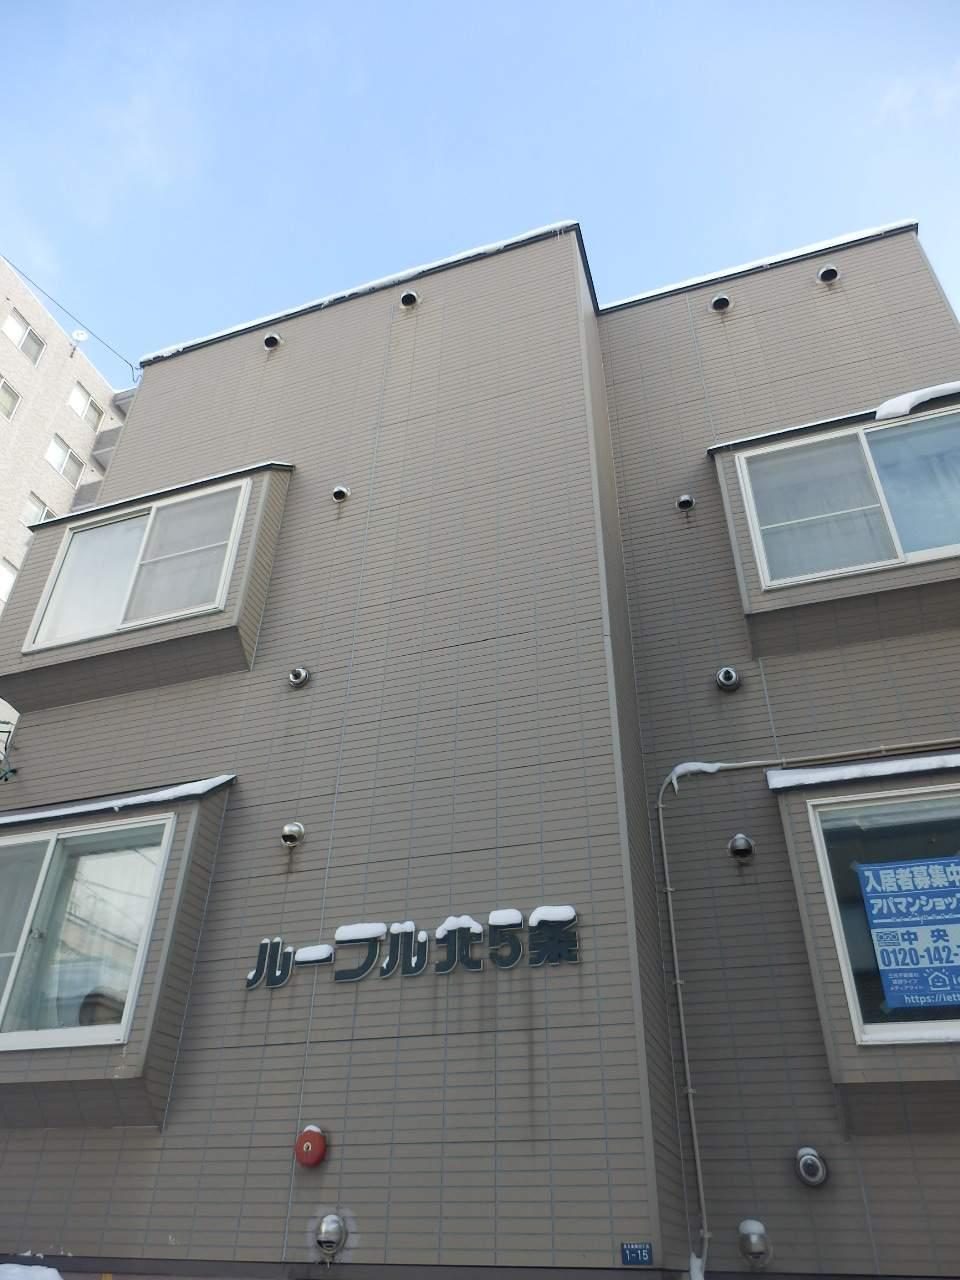 北海道札幌市中央区、二十四軒駅徒歩16分の築20年 3階建の賃貸アパート